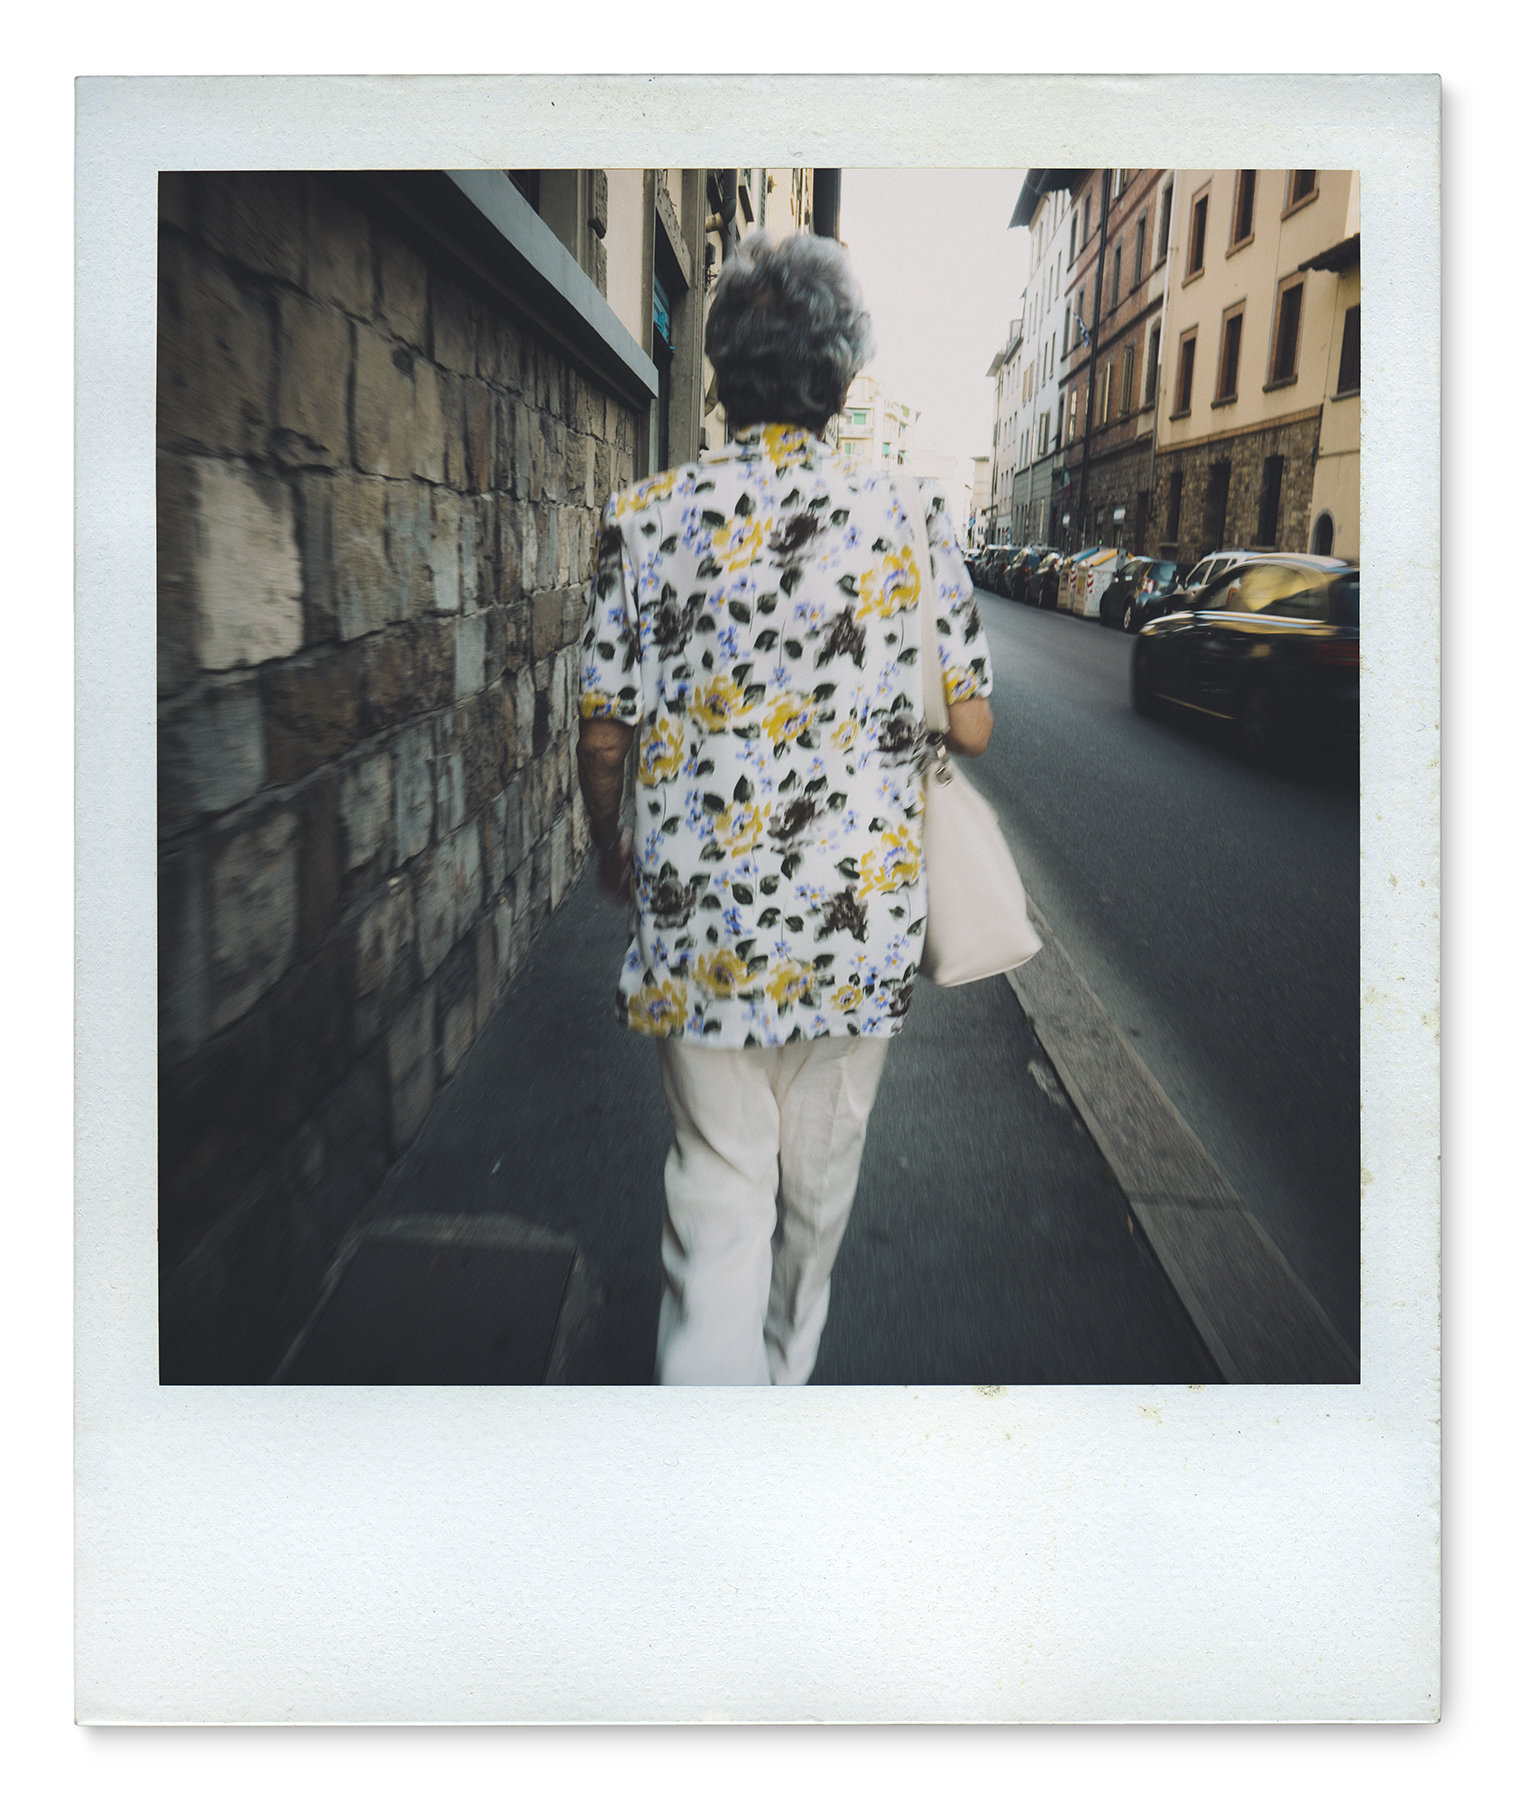 033_Polaroid SX70_DSC05899.jpg